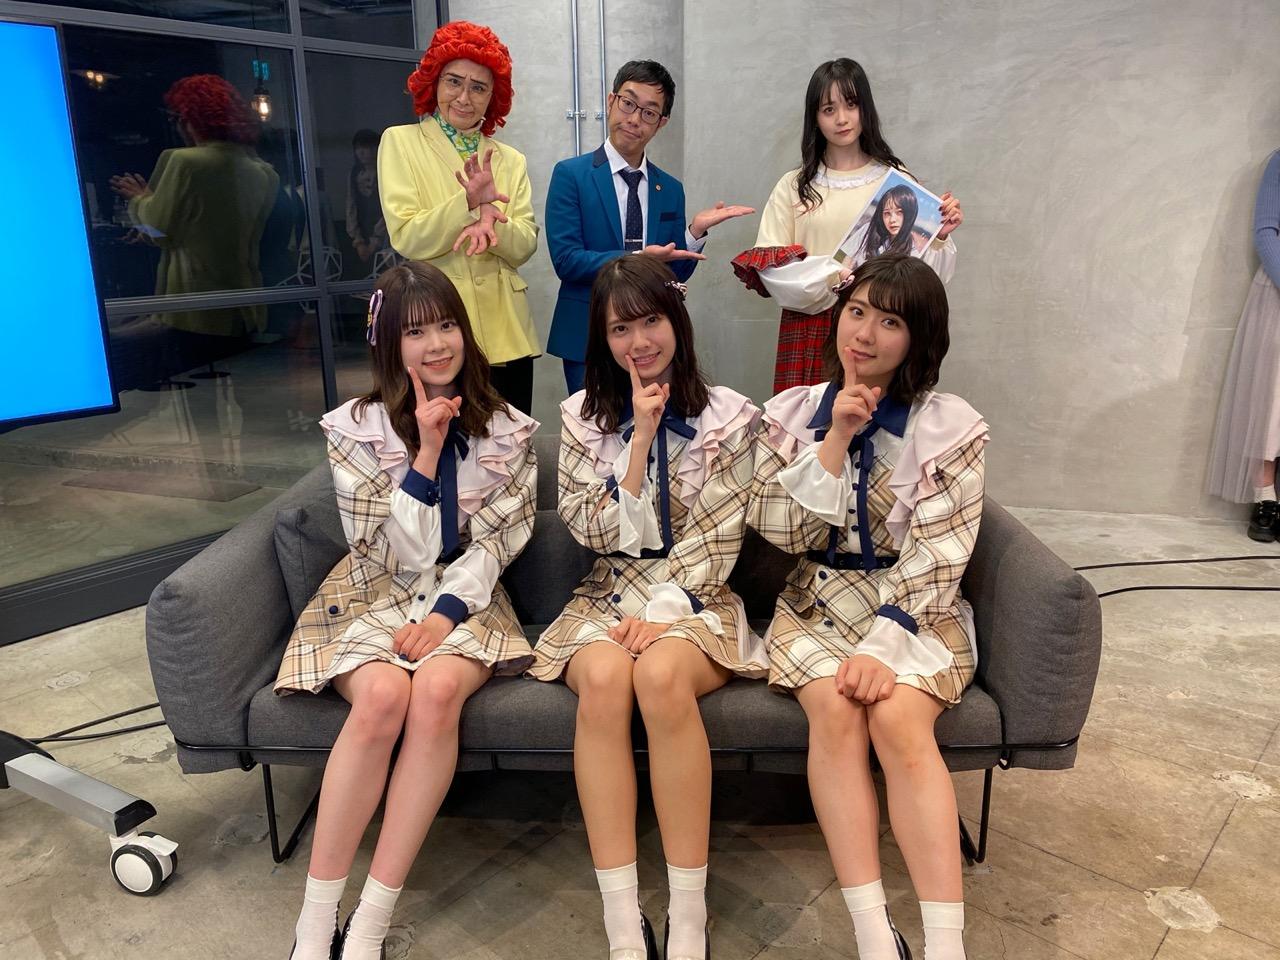 「AKB48 TEAM8のナイショ哲学」初放送!横山結衣・清水麻璃亜・吉川七瀬・小田えりながナイショにしていたあざといテクニックを解禁!【チバテレ】